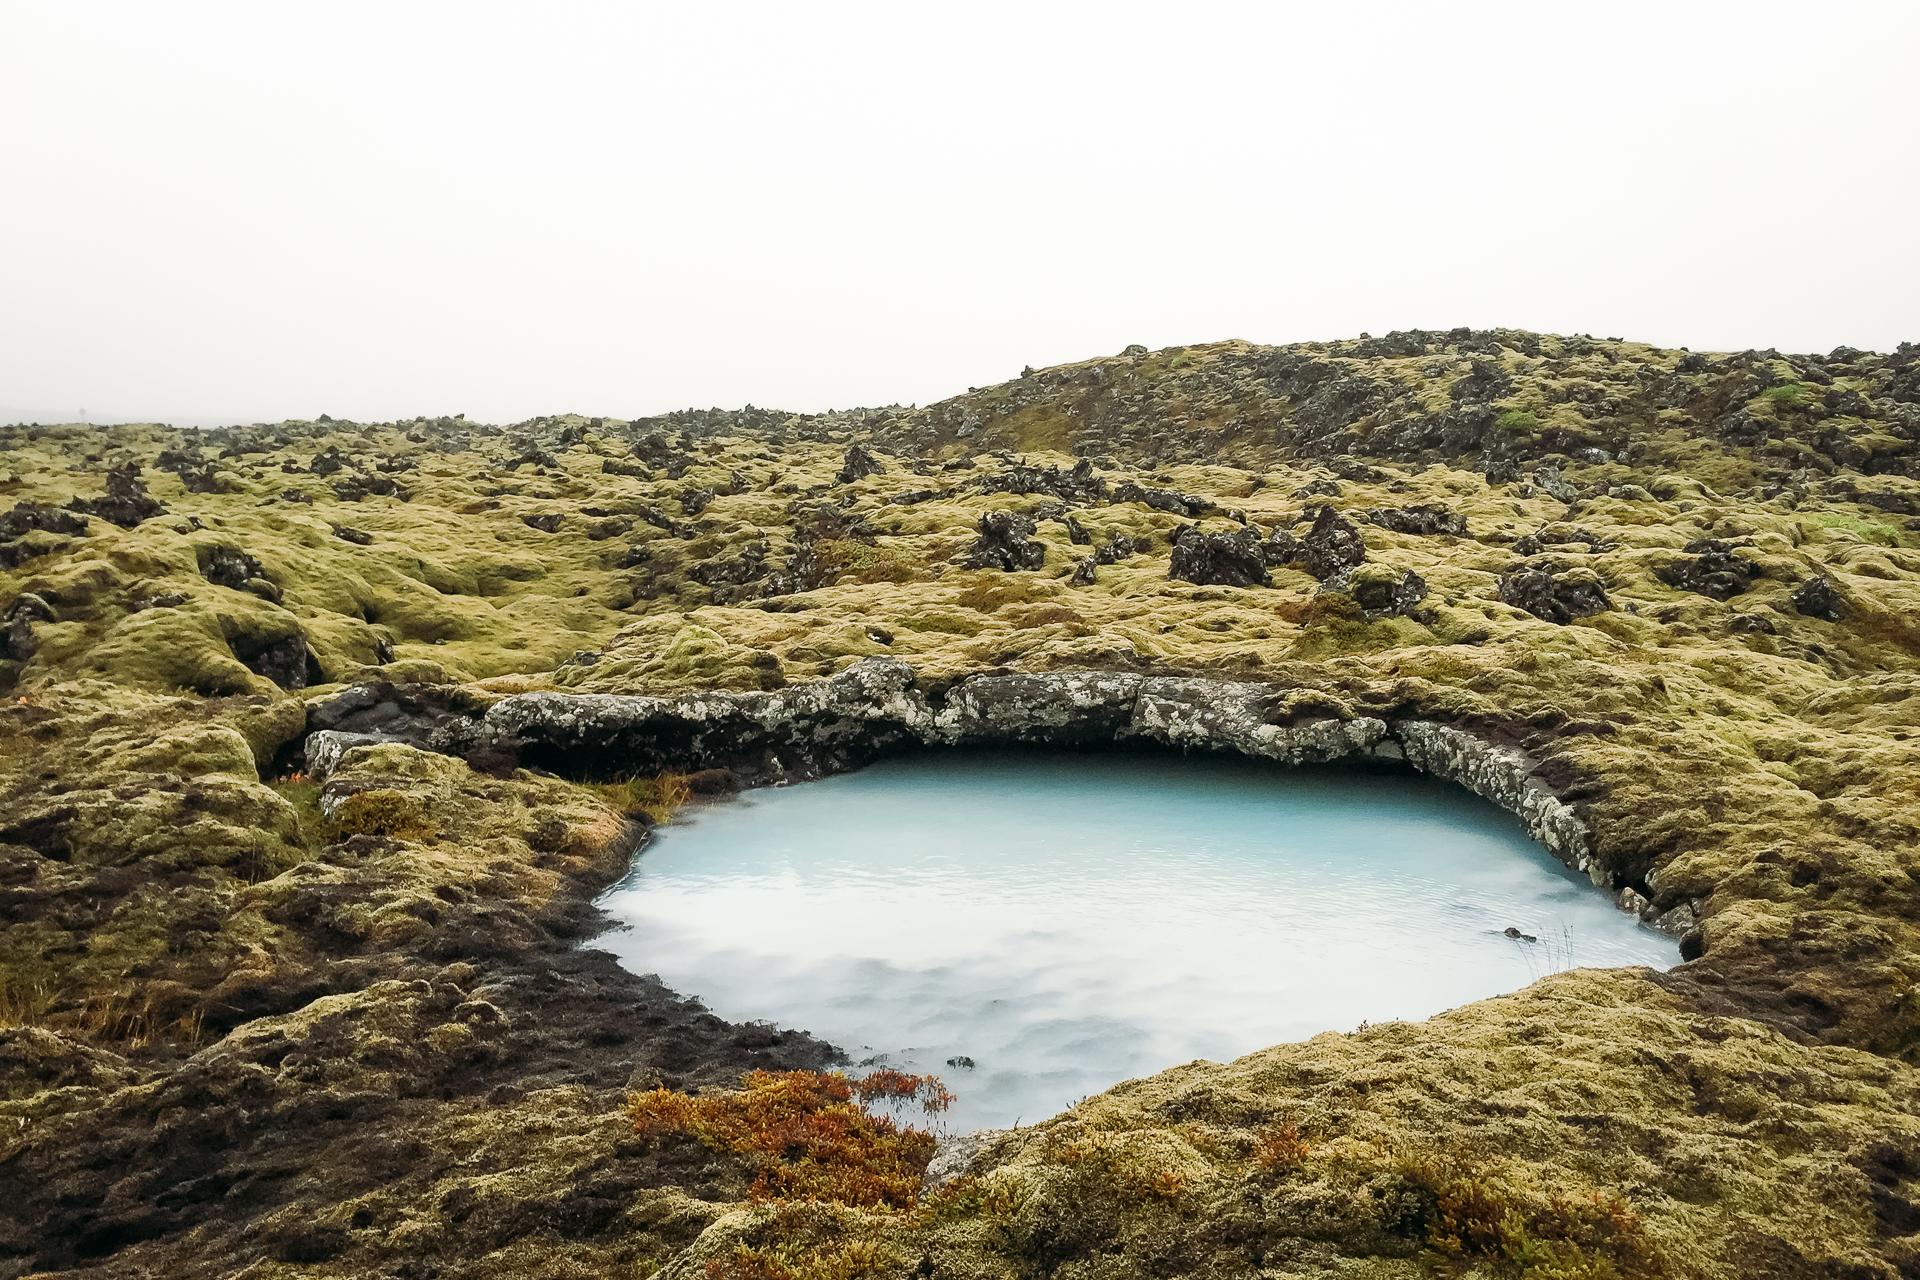 Blue Lagoon, Reykjanes Peninsula, Iceland